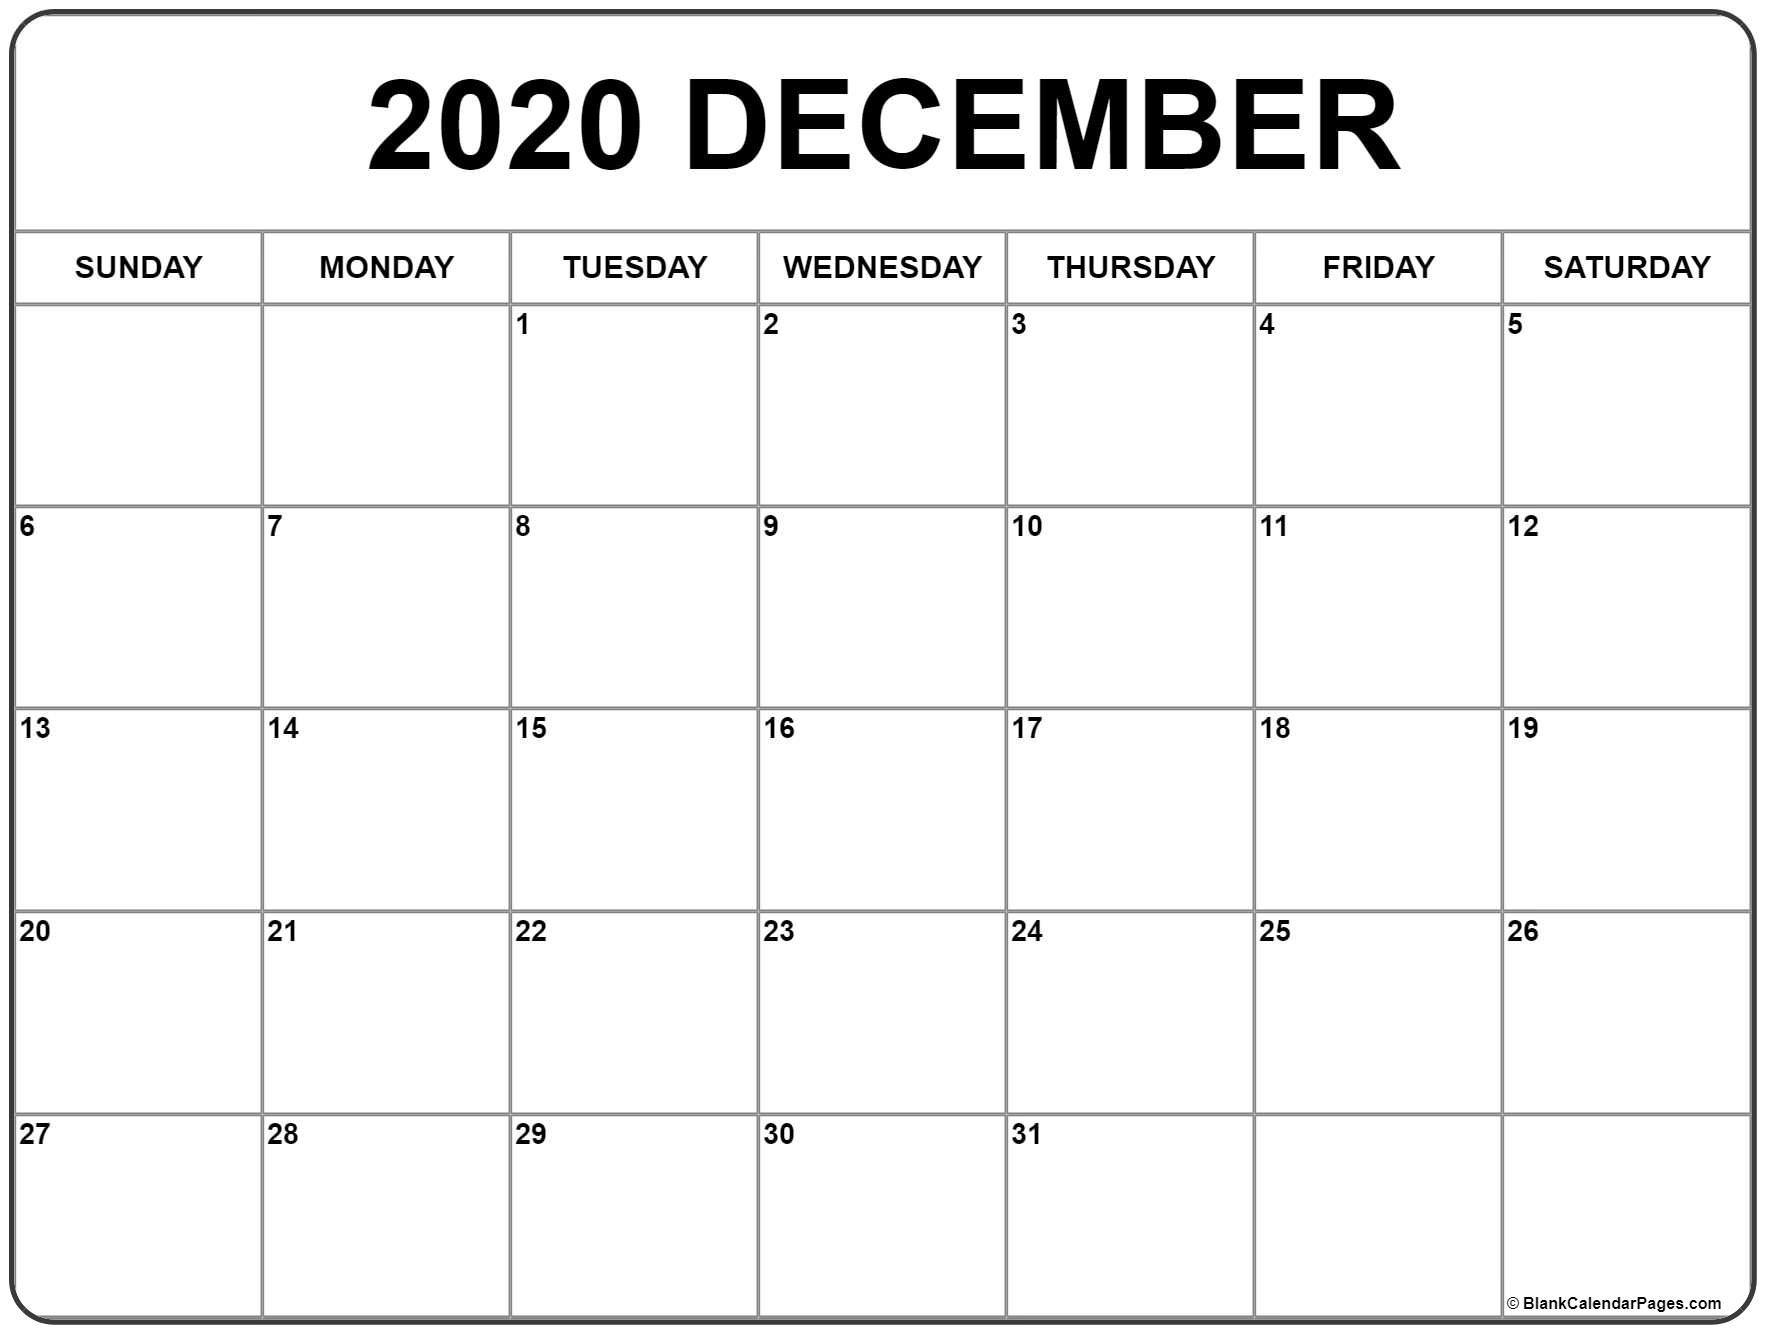 December 2020 Printable Calendar Template #2020Calendars